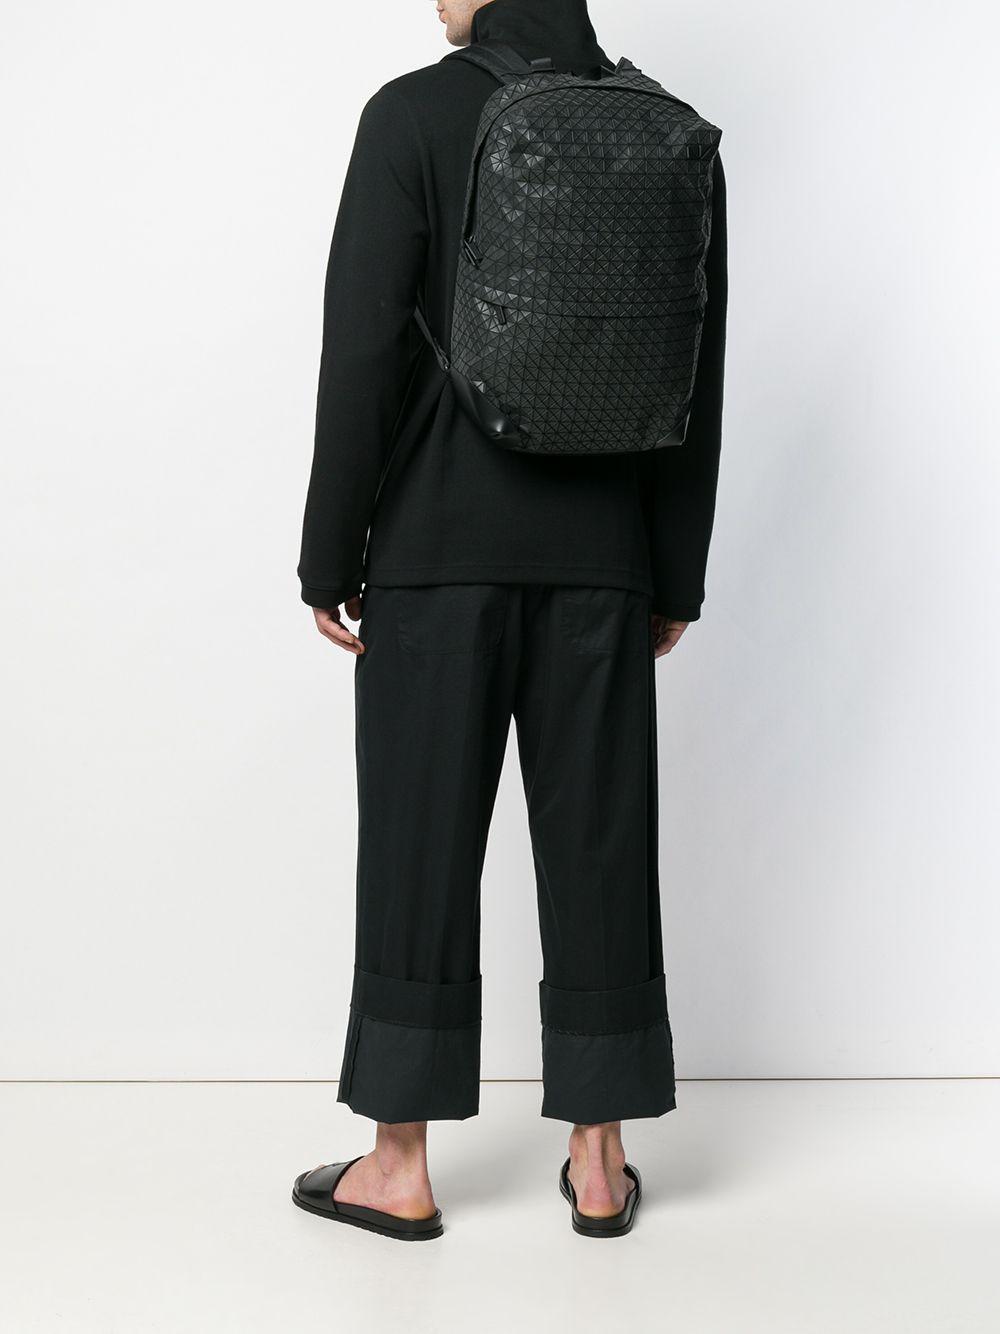 Bao Bao Issey Miyake - Black Backpack With Prismatic Design for Men - Lyst.  View fullscreen 6309ccfa966e9